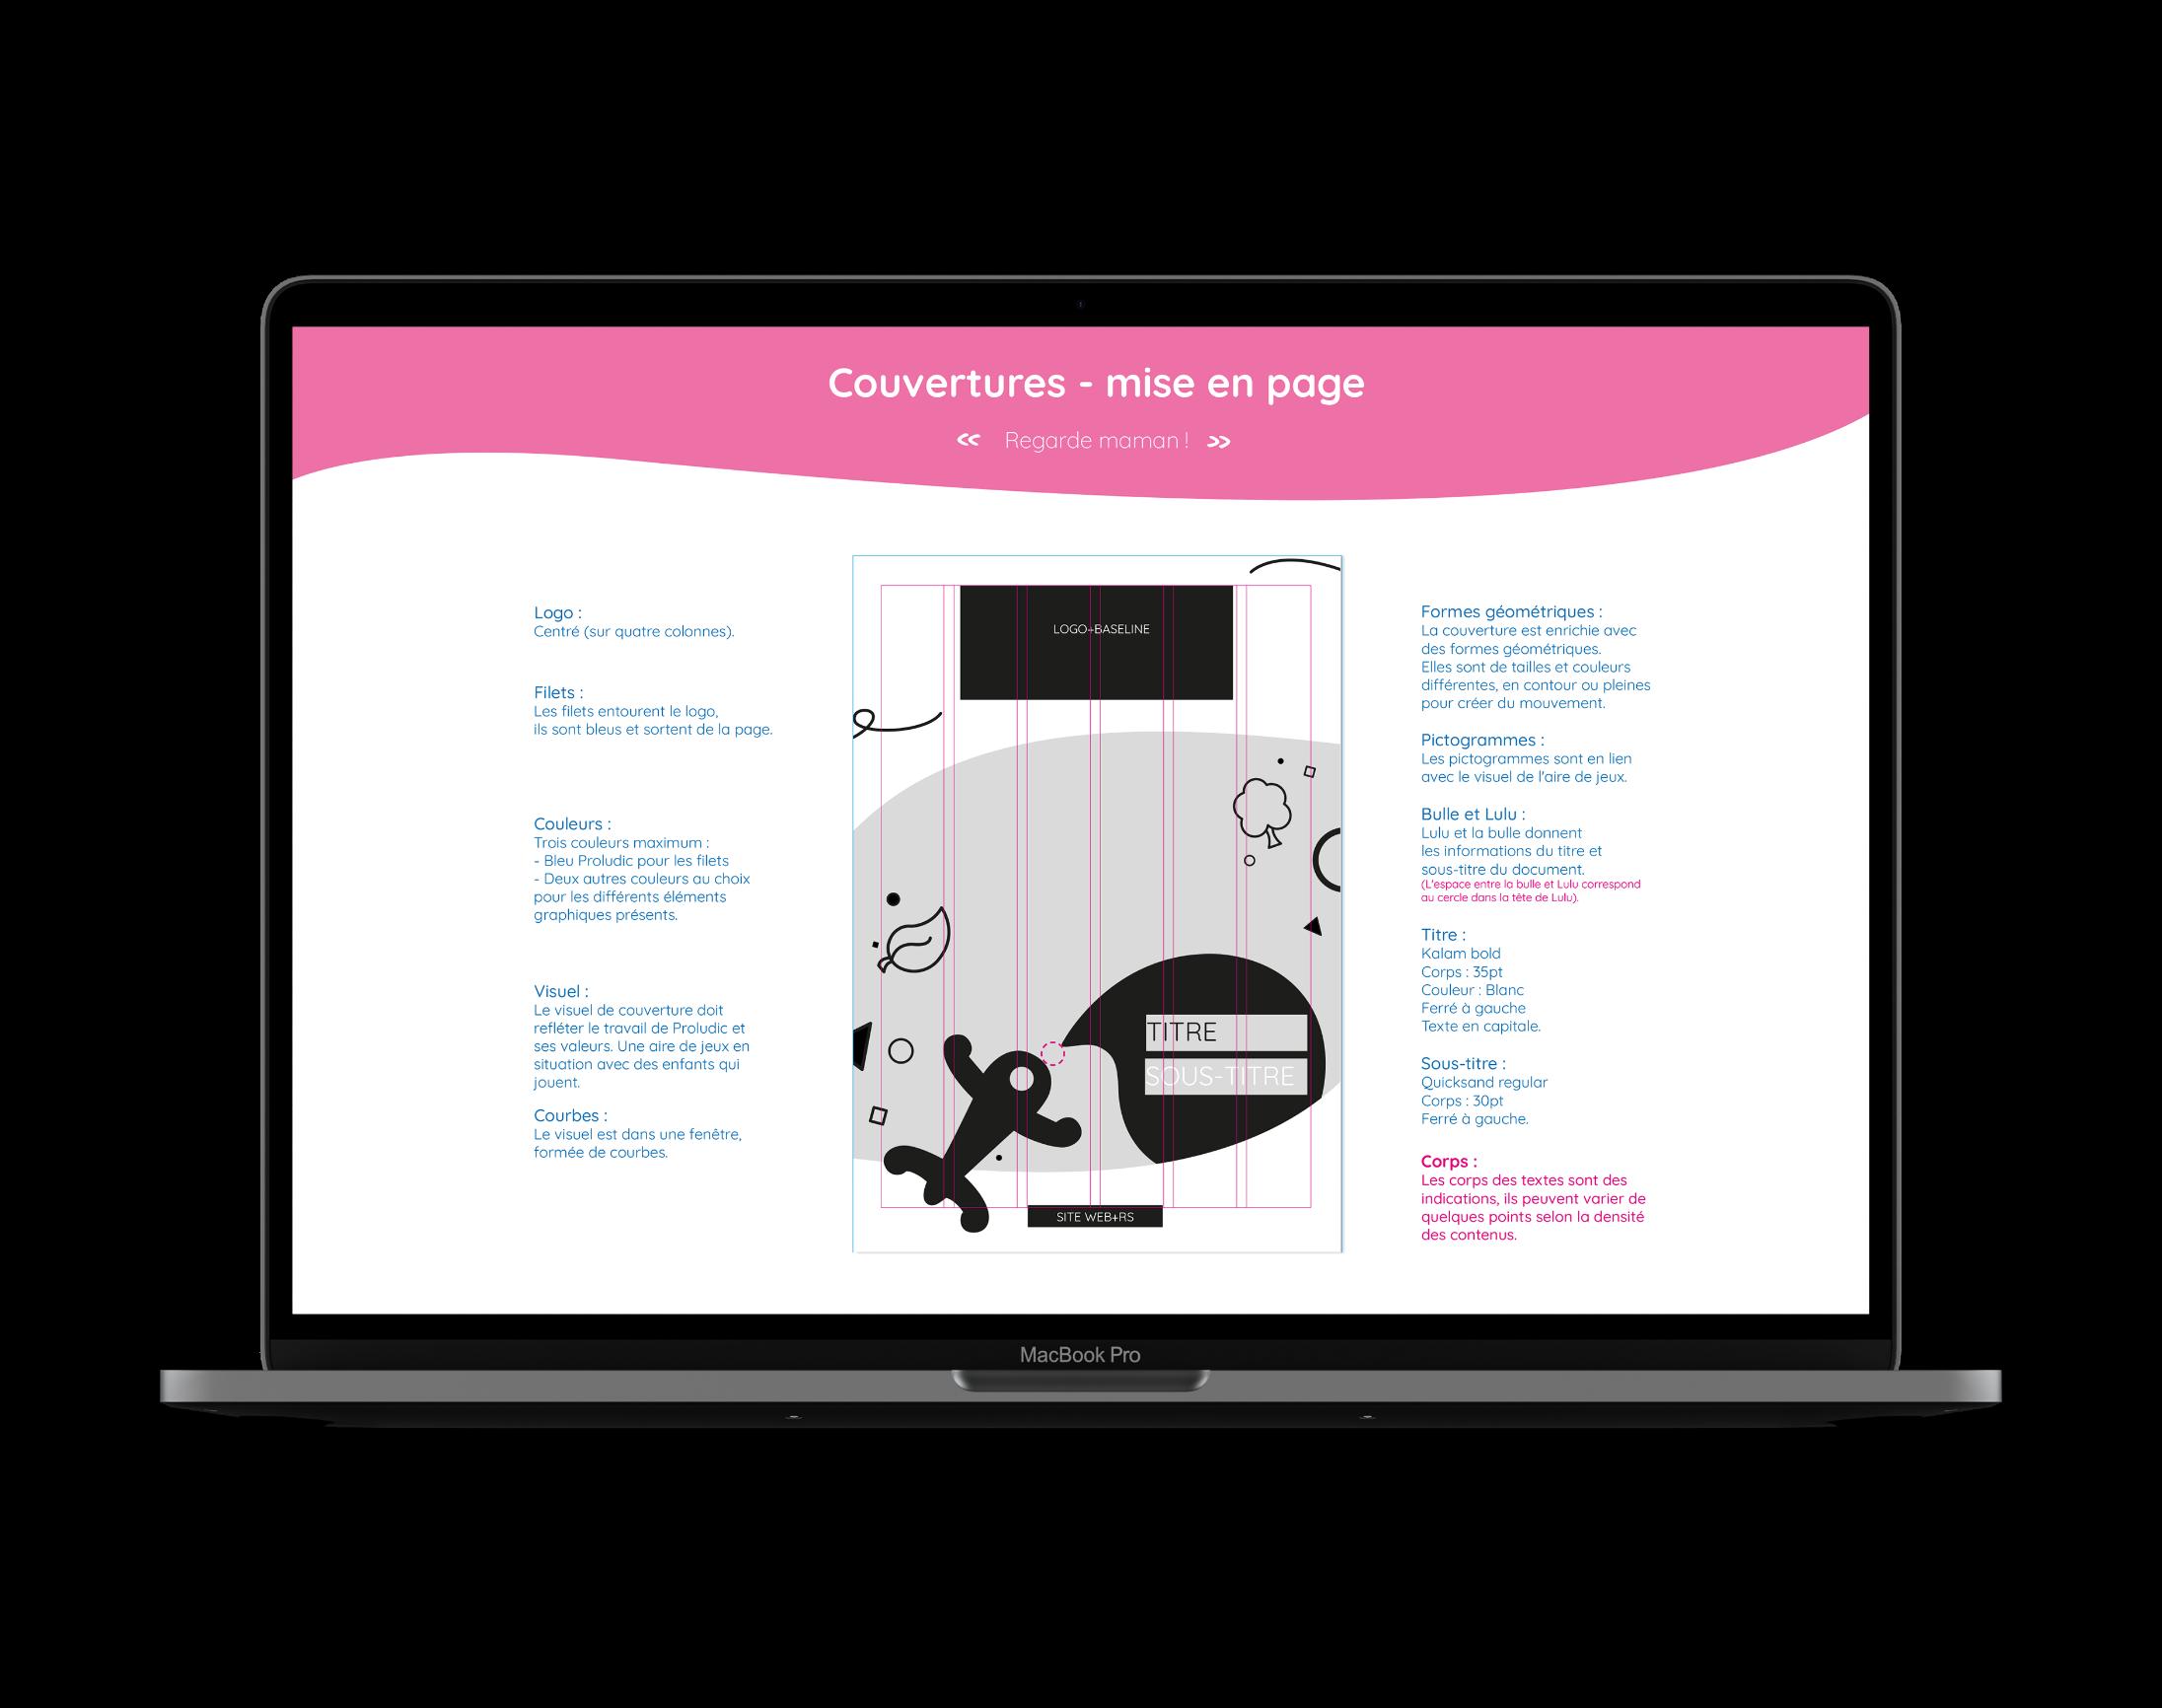 image-charte-graphique-proludic-agence-conseil-en-communication-Letb-synergie